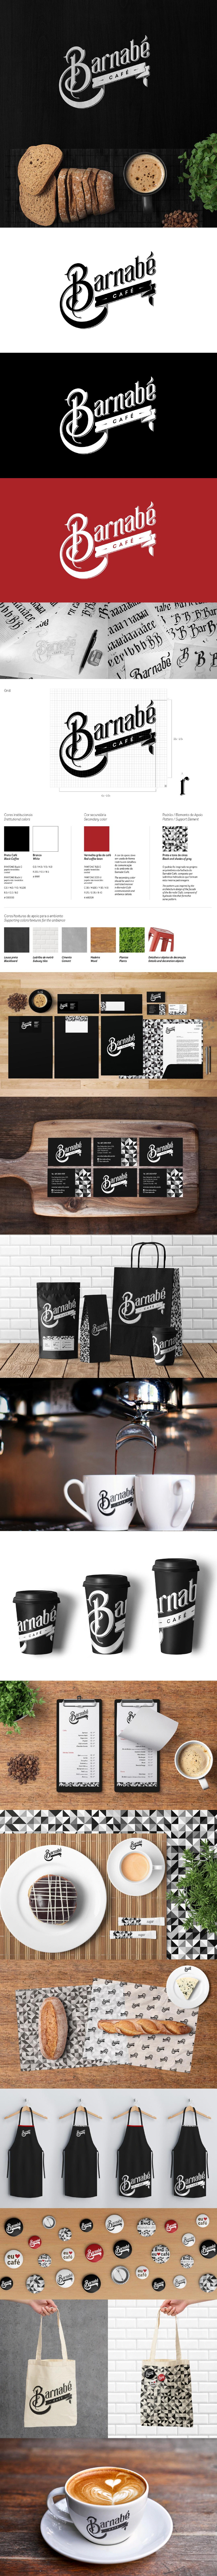 Branding,Graphic Design,Calligraphy